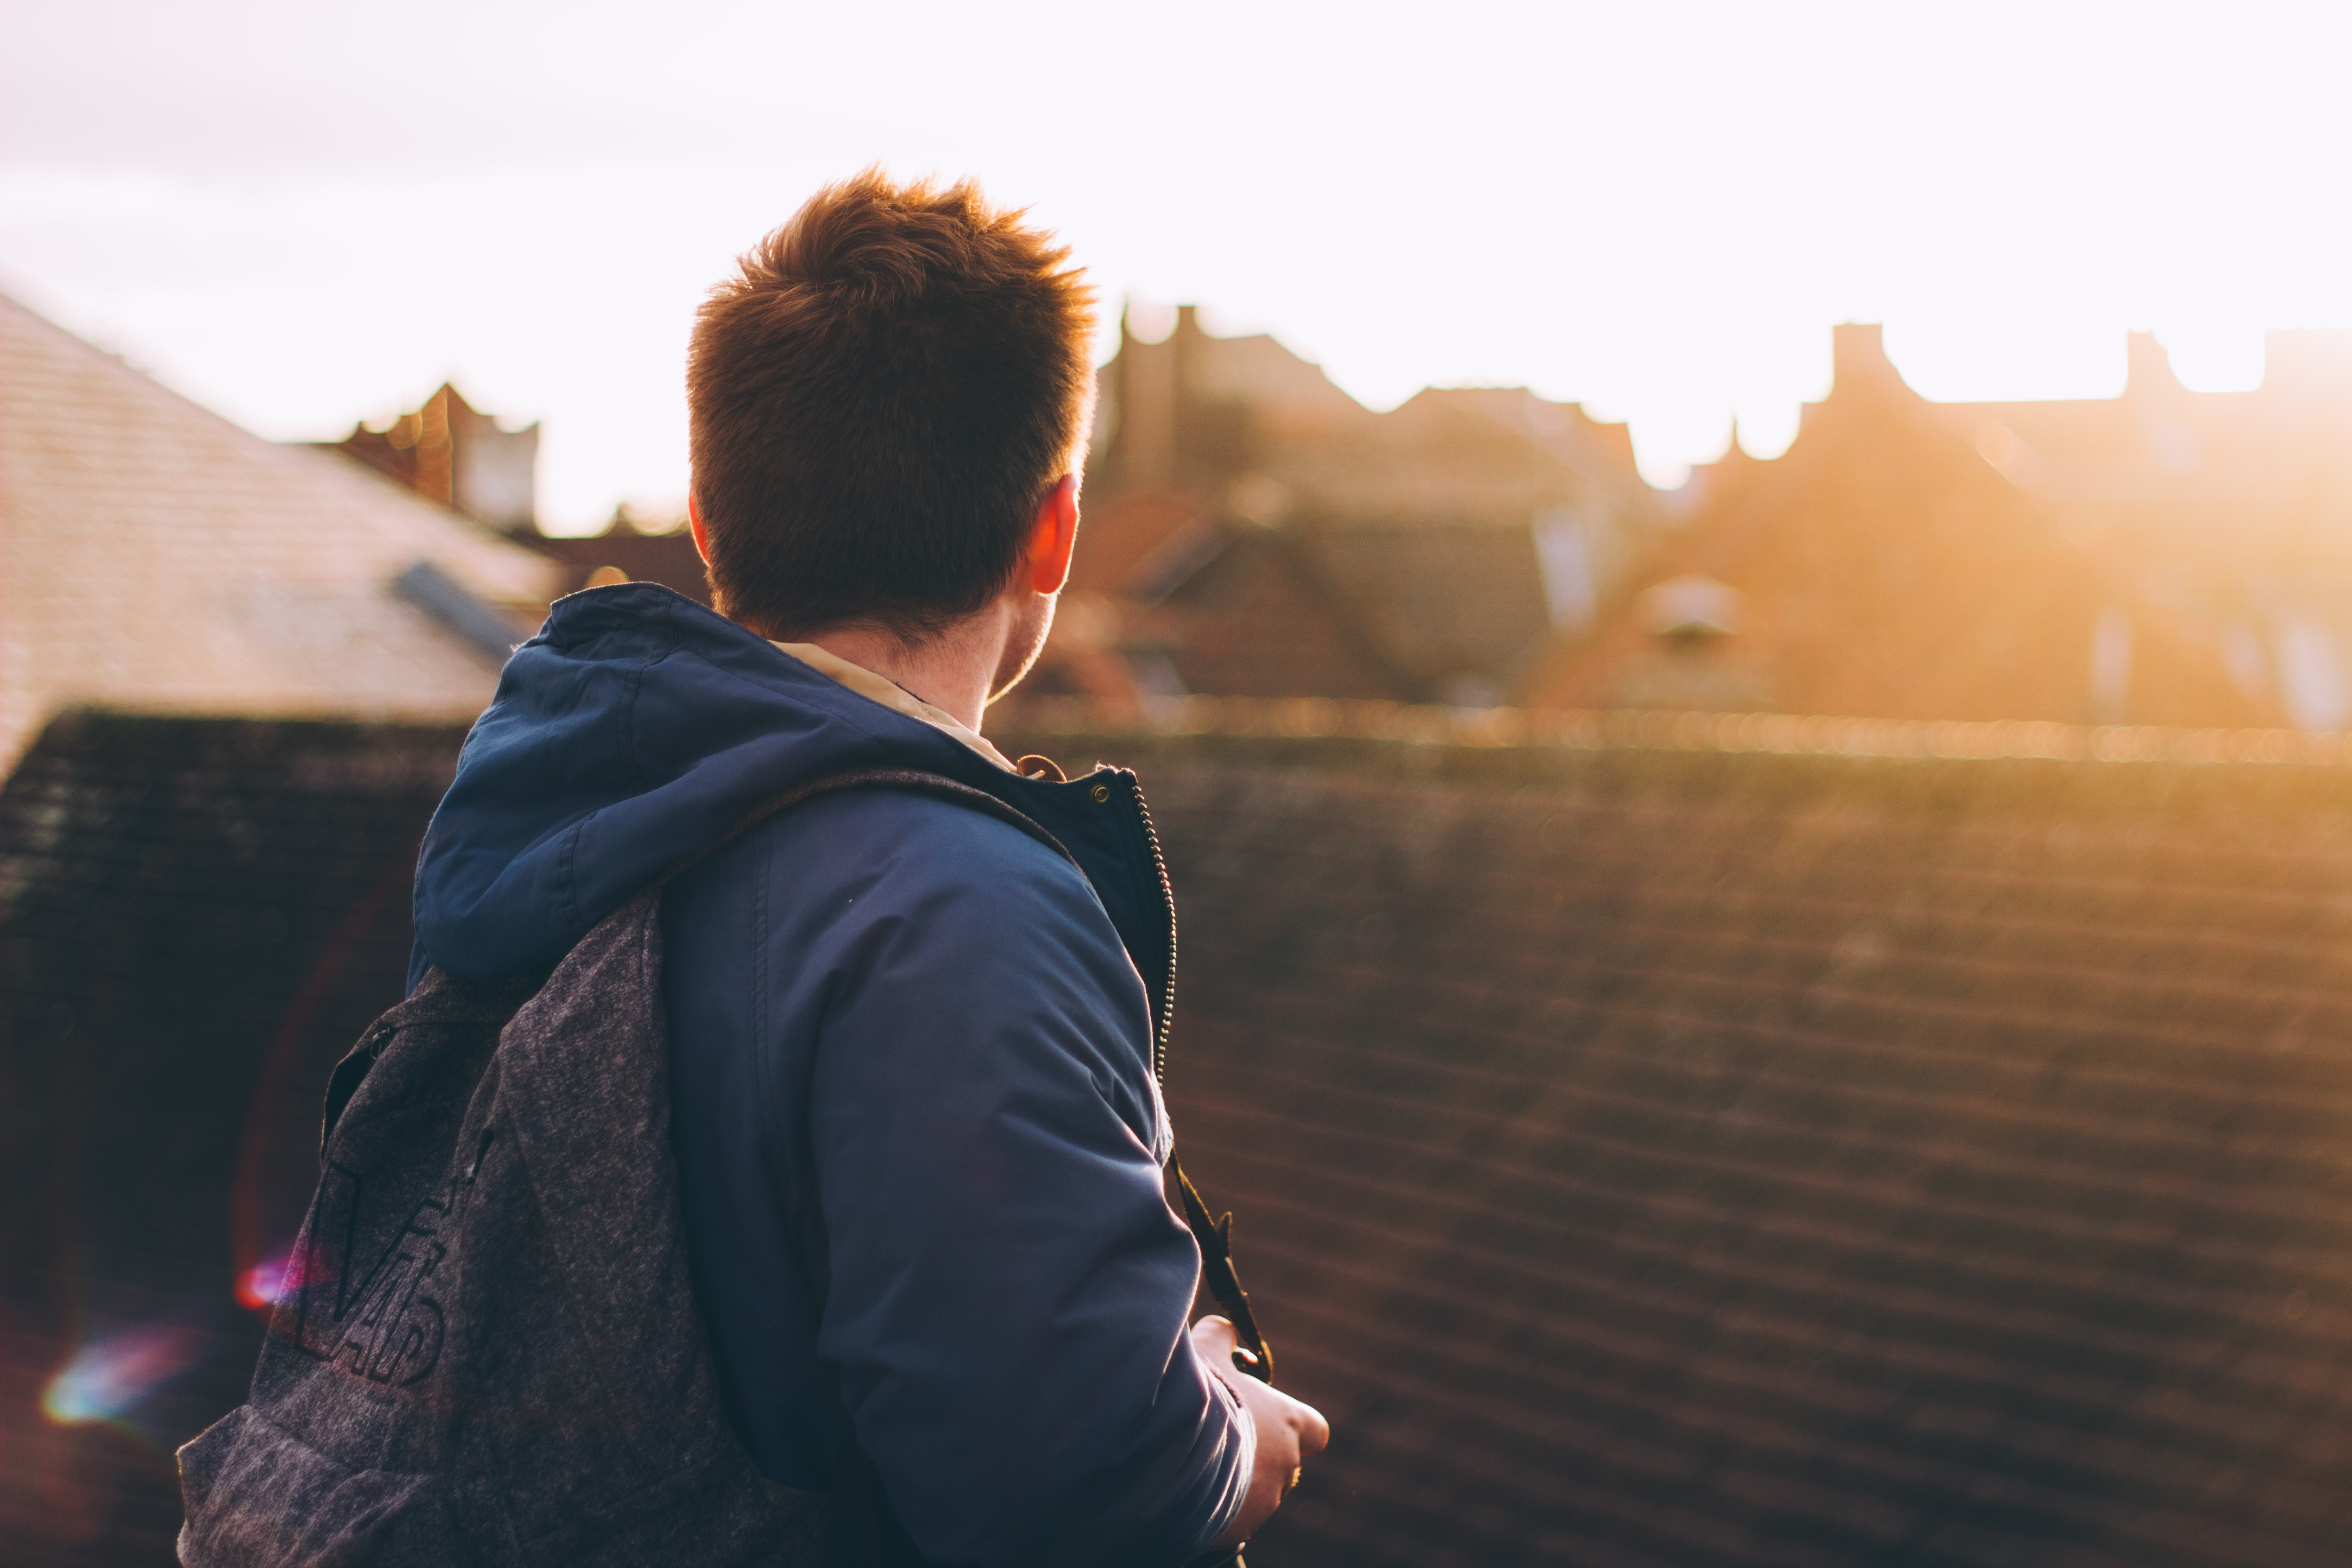 Man looking across York rooftops